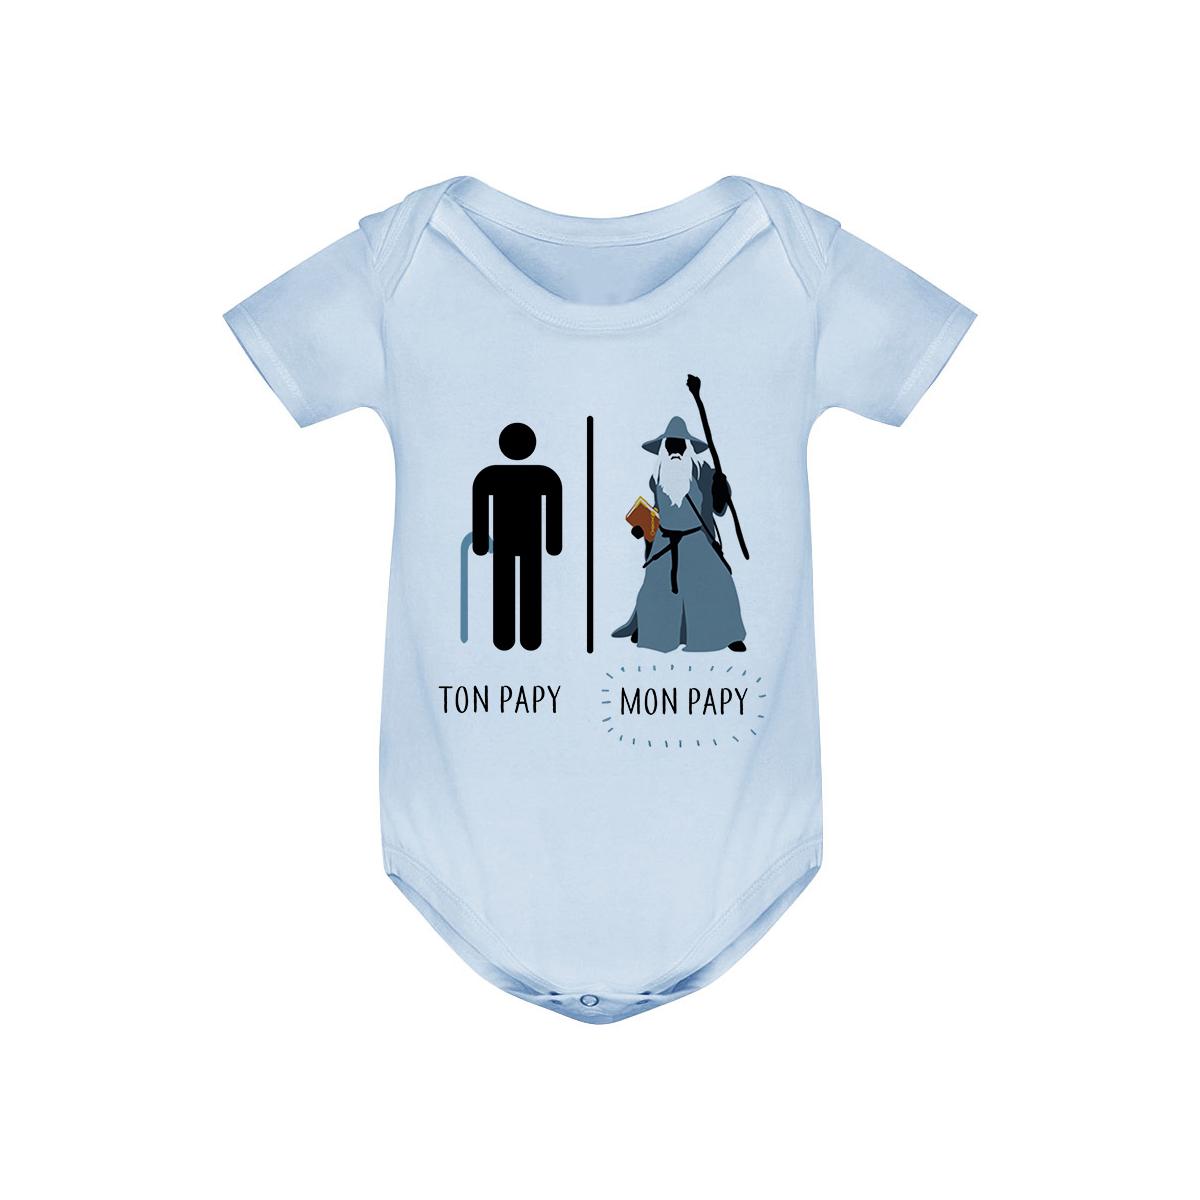 Body bébé Ton papy - Mon papy